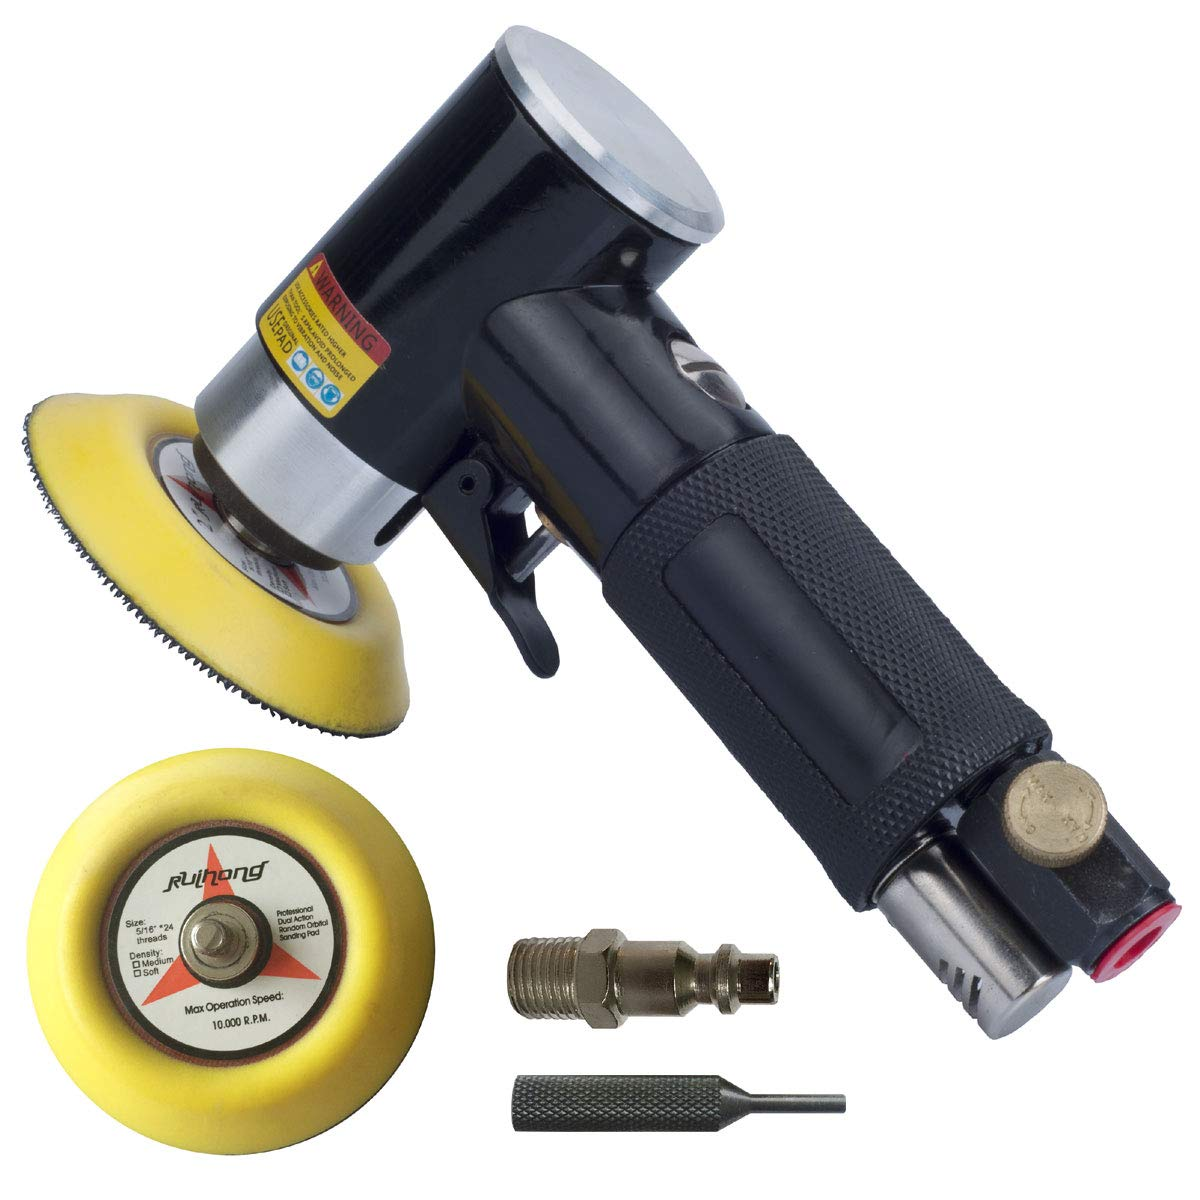 2'' and 3'' Random Orbital Air Sander, Pneumatic Sander for auto sanding tools, Dual Action Polisher, air angle sander, pneumatic angle sander